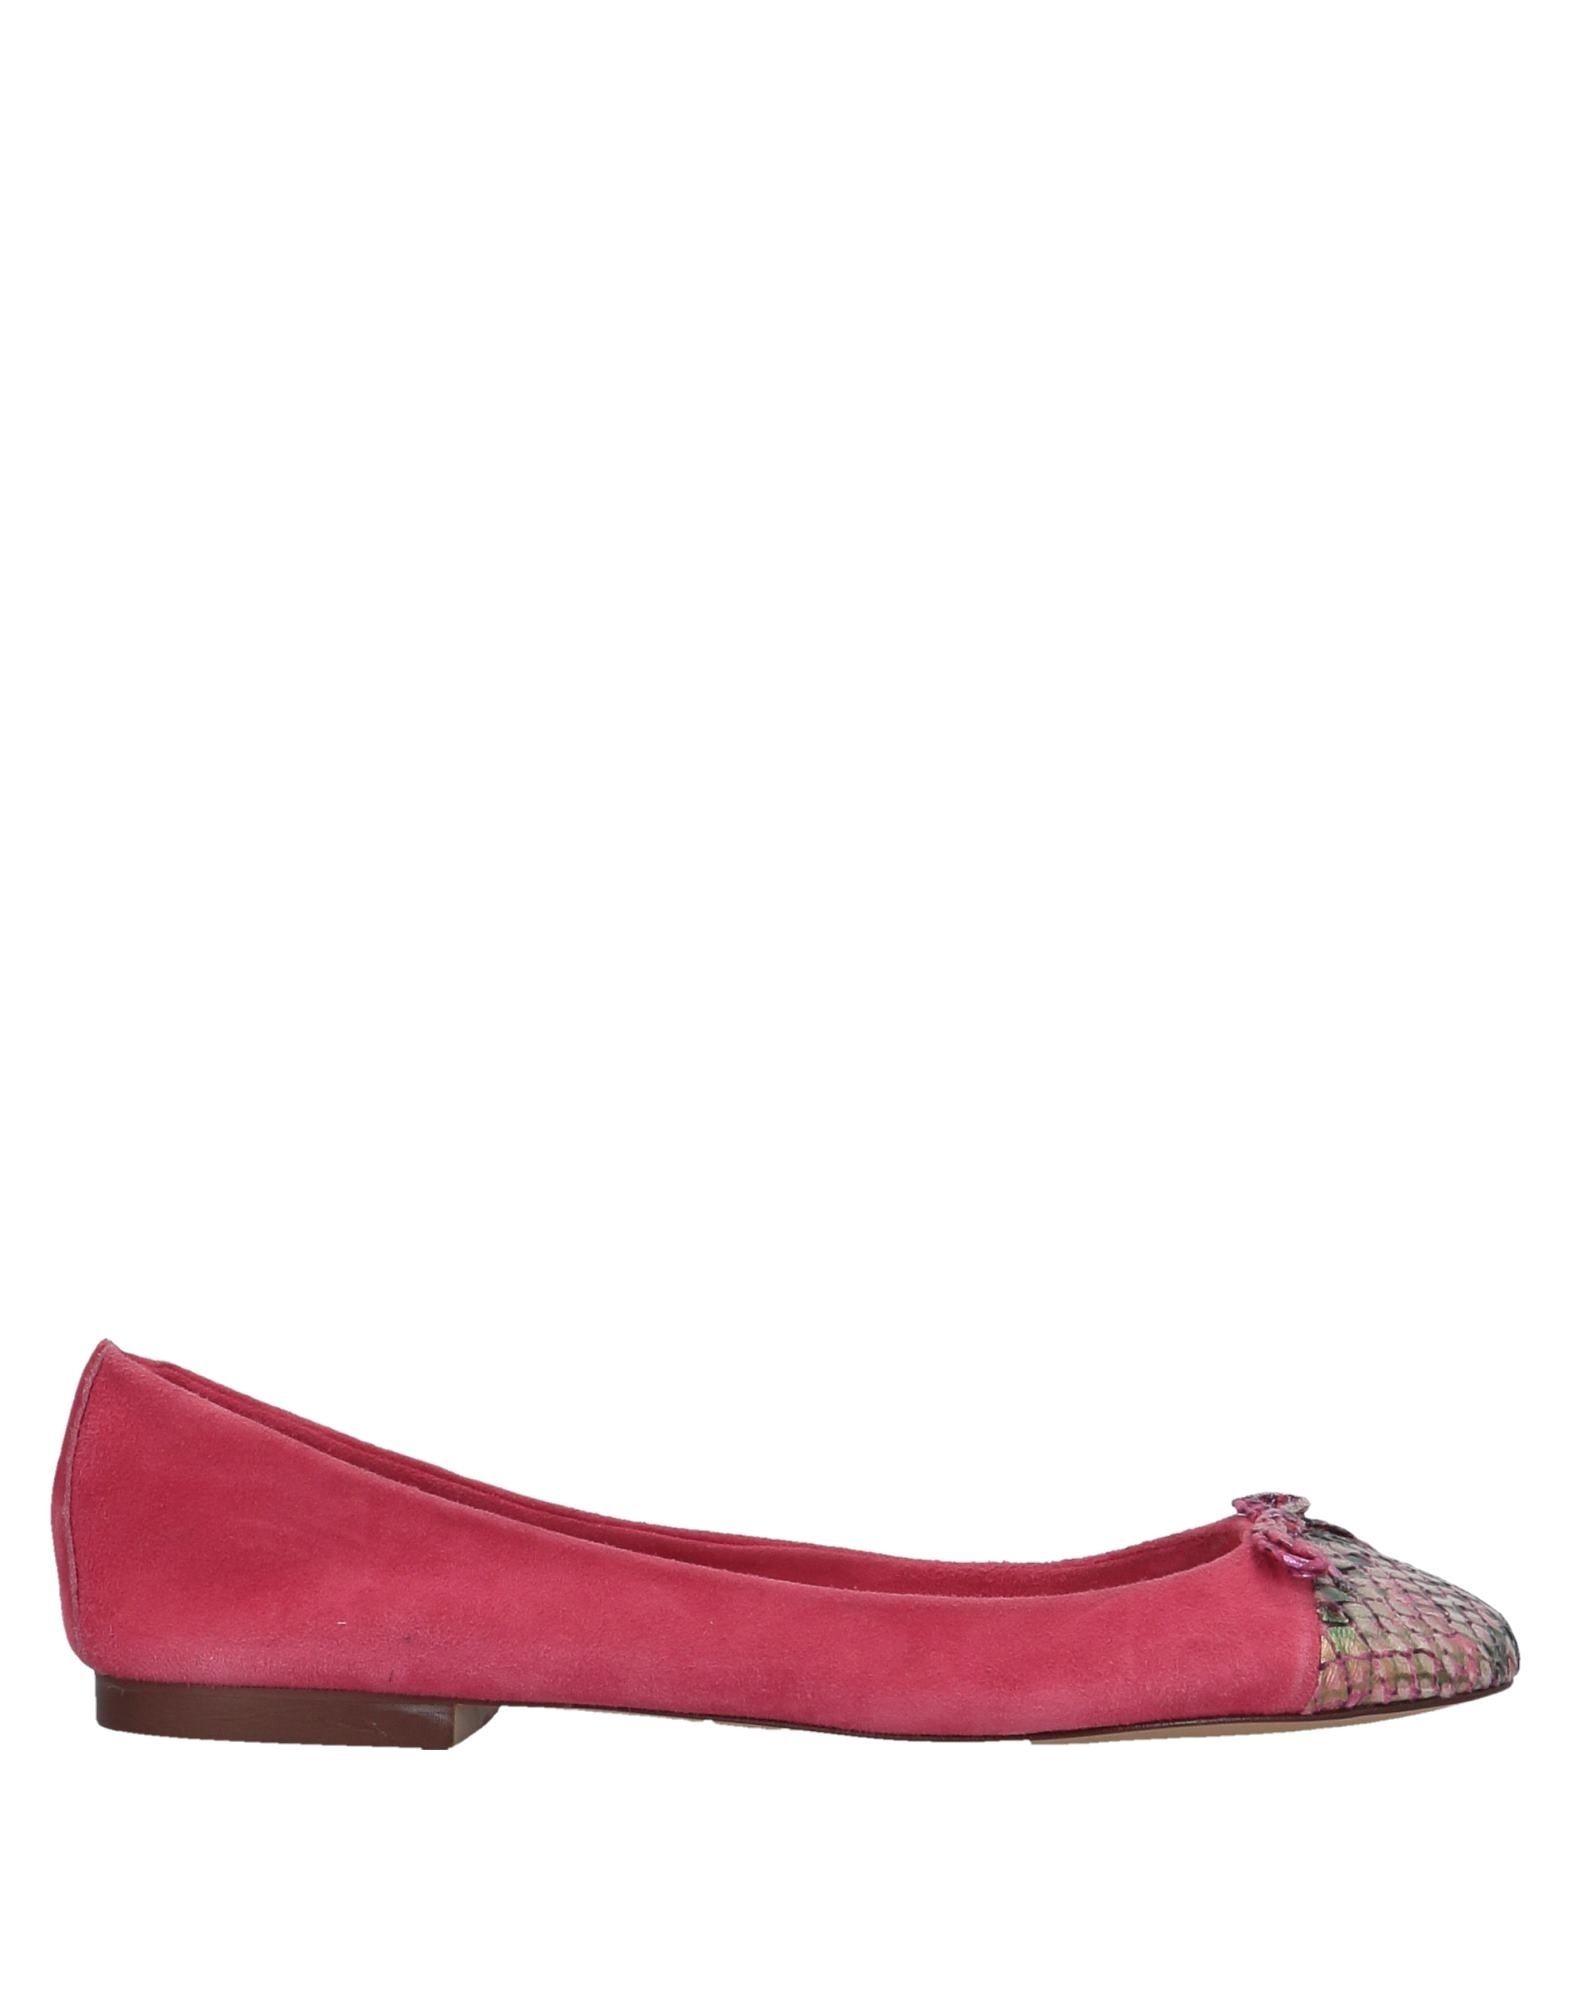 TOSCA BLU SHOES Балетки meotina women wedding shoes 2018 spring platform high heels shoes pumps peep toe bow white slip on sexy shoes ladies size 34 43